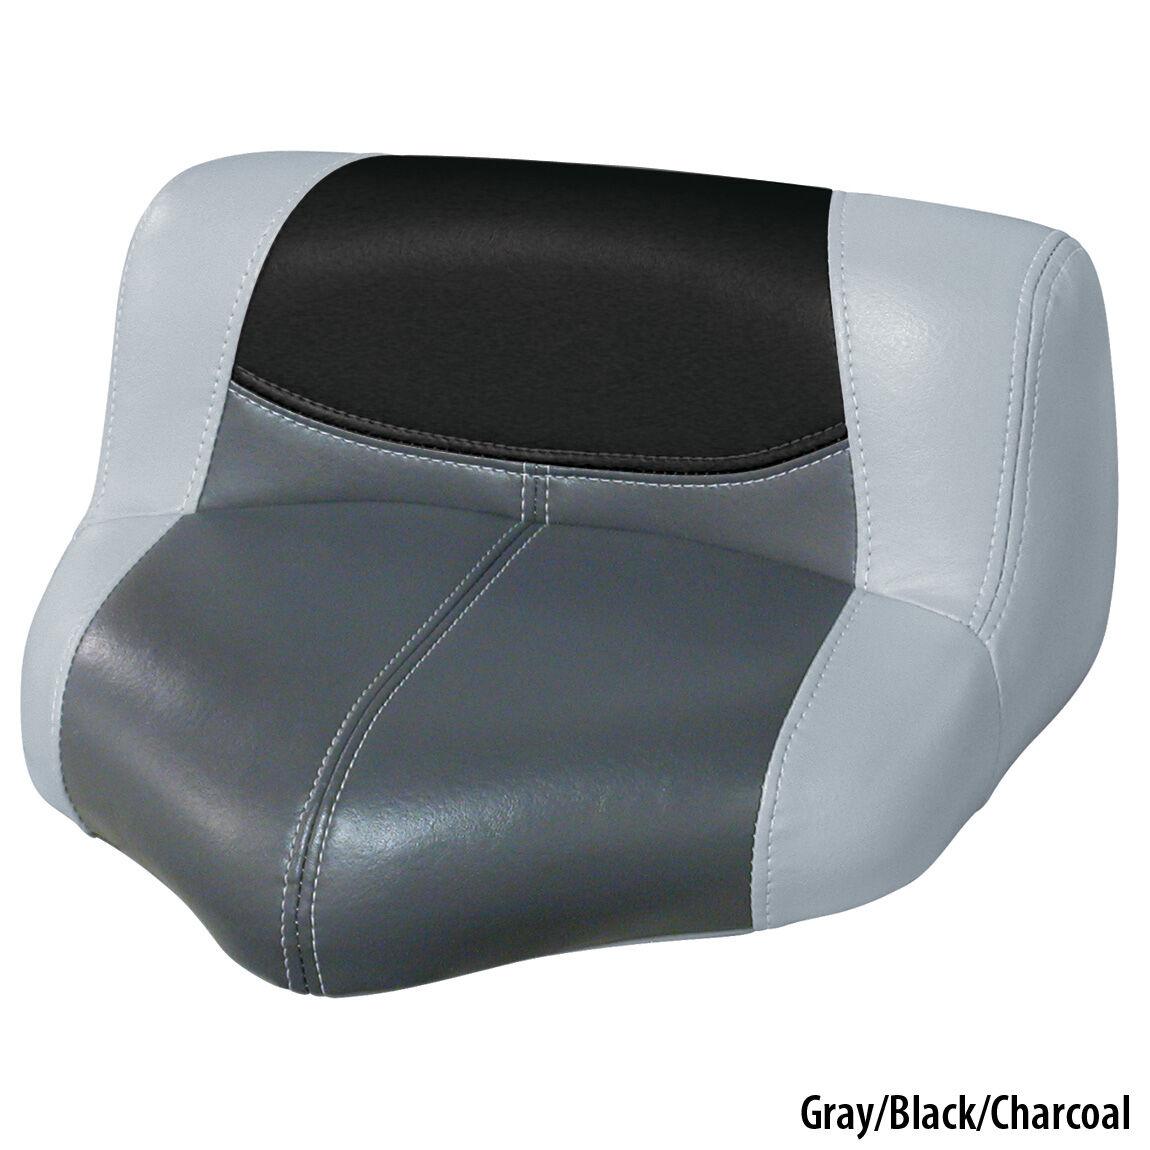 Wise Blast-Off Oversize Frame Pro Casting Seat